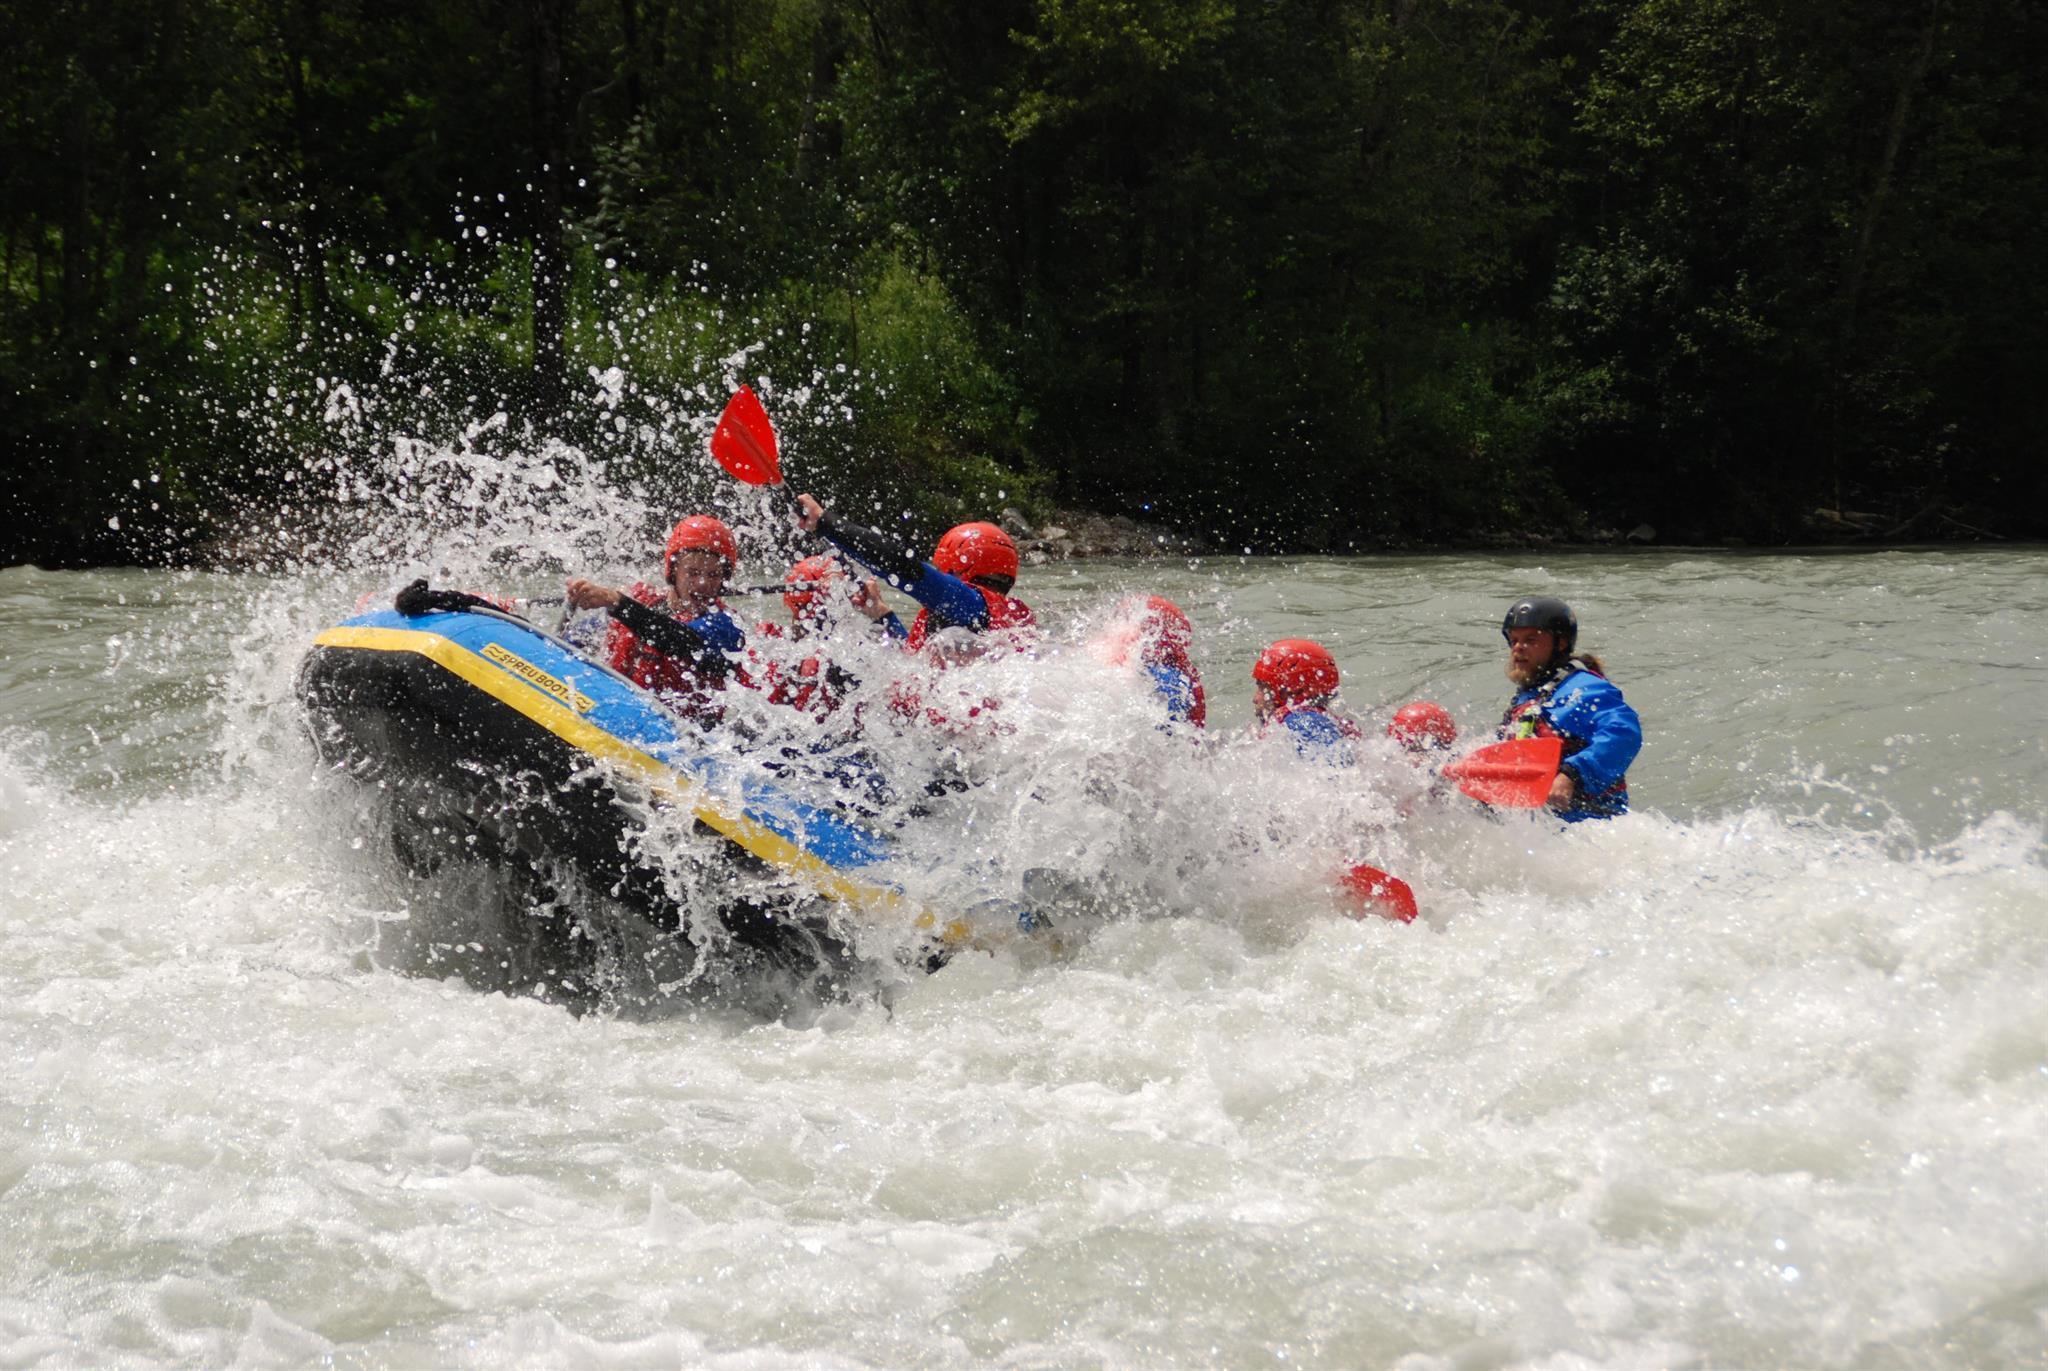 Rafting-Adrenalin-Outdoor-Sports.jpg